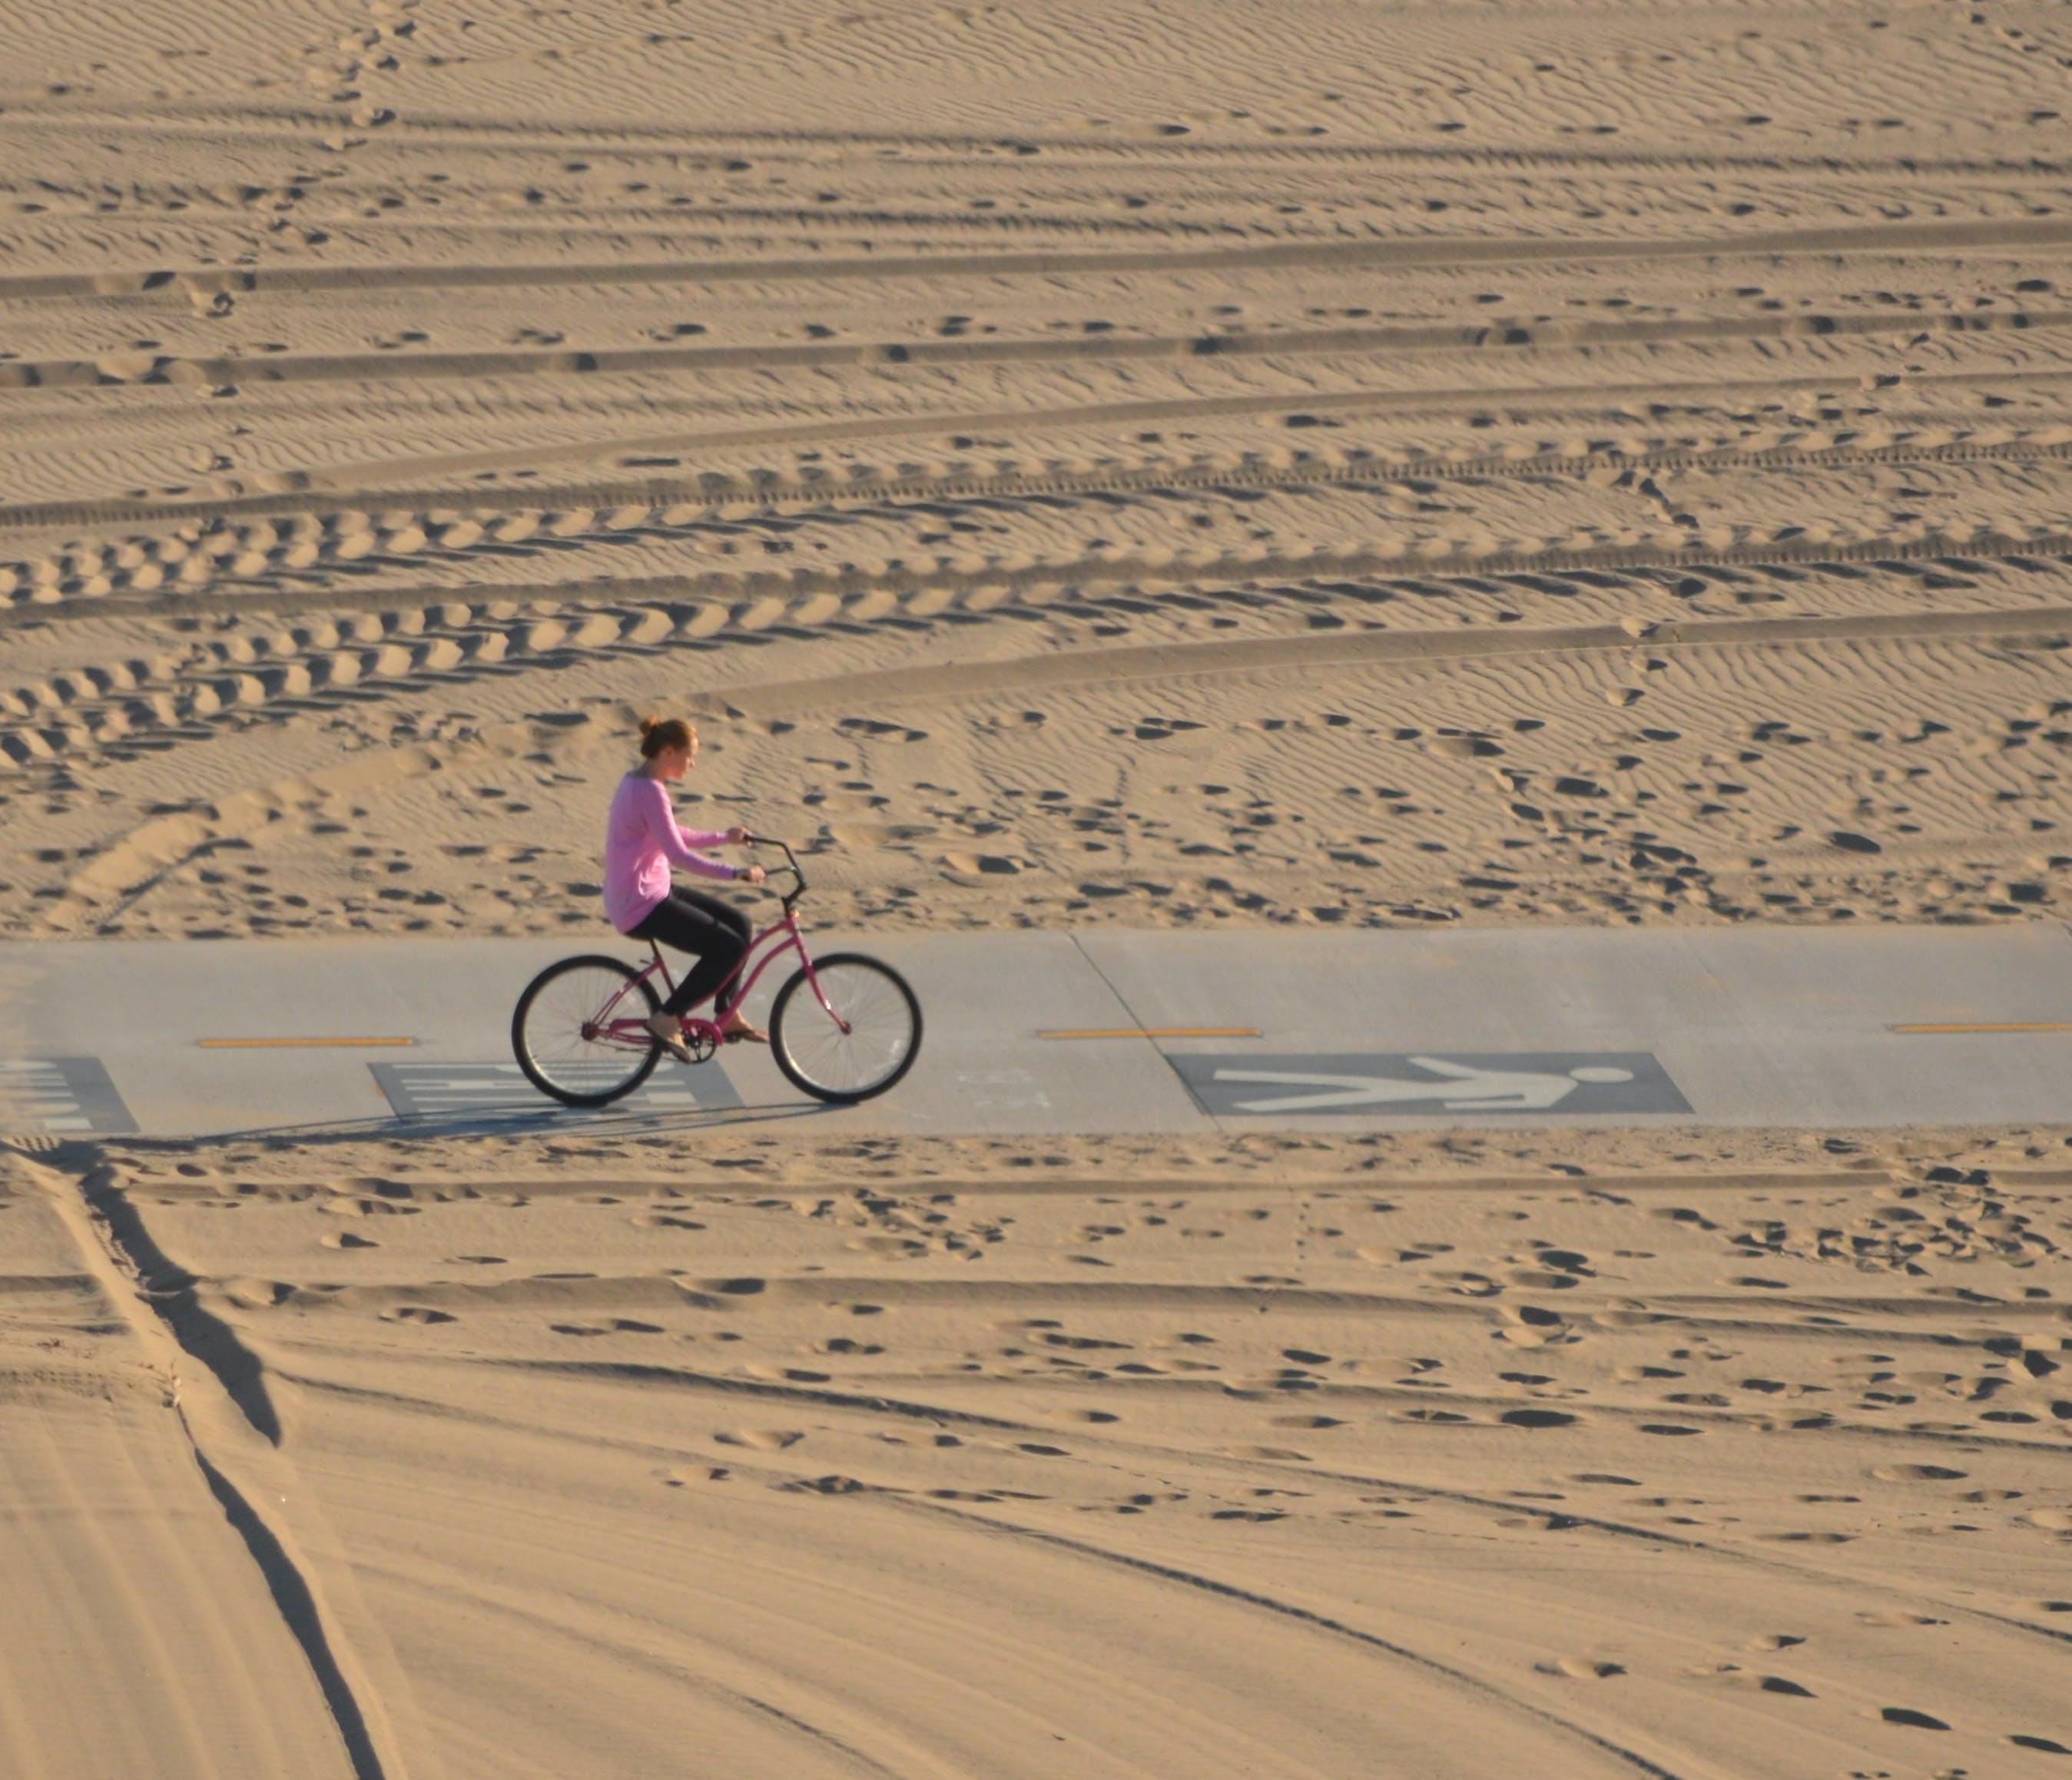 Kostenloses Stock Foto zu beach cruiser, cruiser fahrrad, einsamen strand, fahrradtour